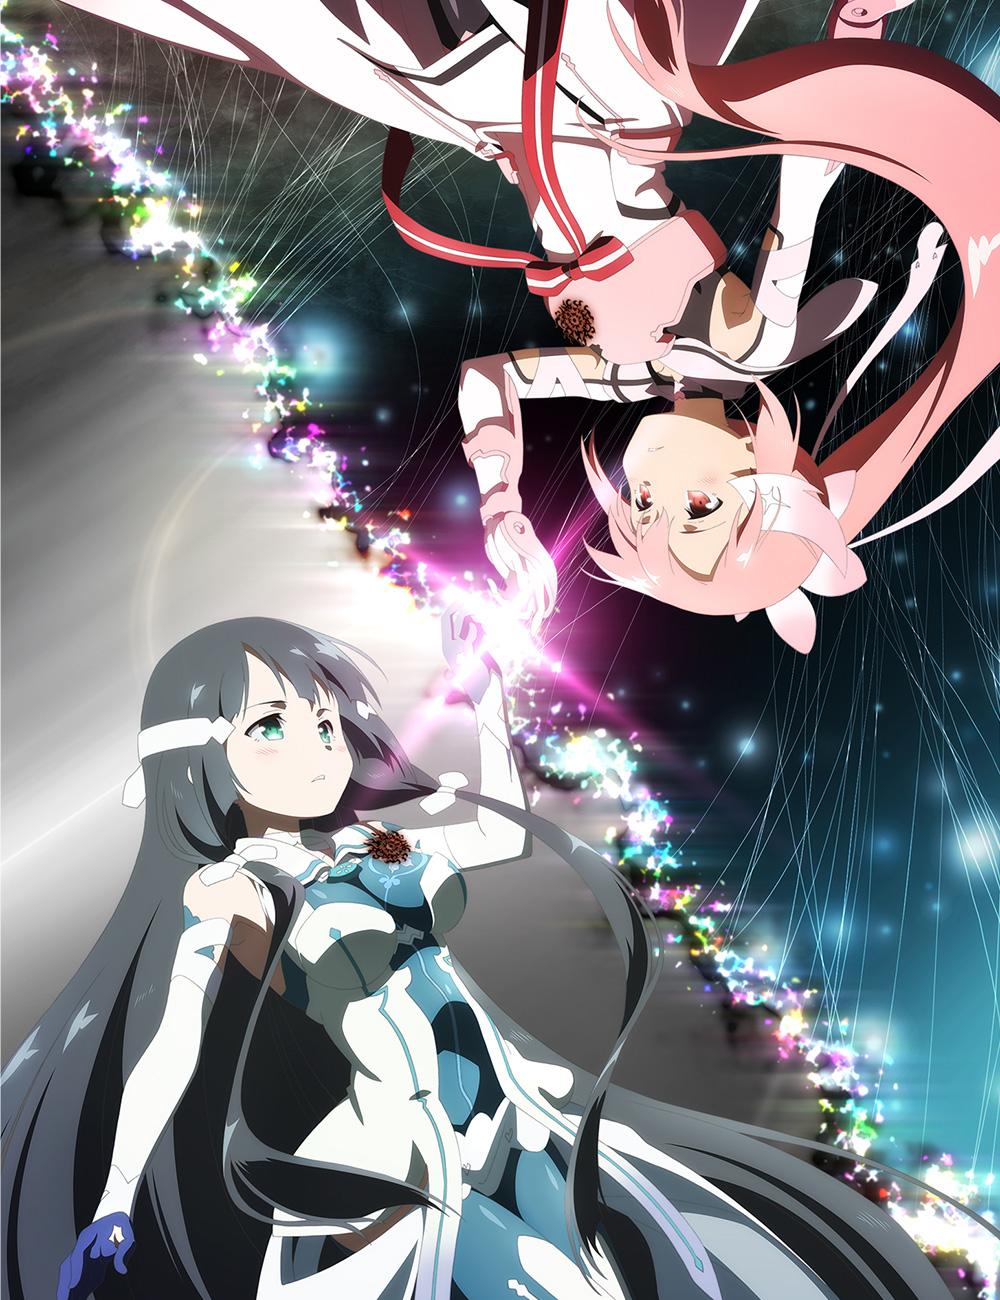 Yuuki Yuuna wa Yuusha de Aru: Yuusha no Shou - Yuki Yuna is a Hero: The Hero Chapter | Yuuki Yuuna là Dũng Giả: Chương về Dũng Giả